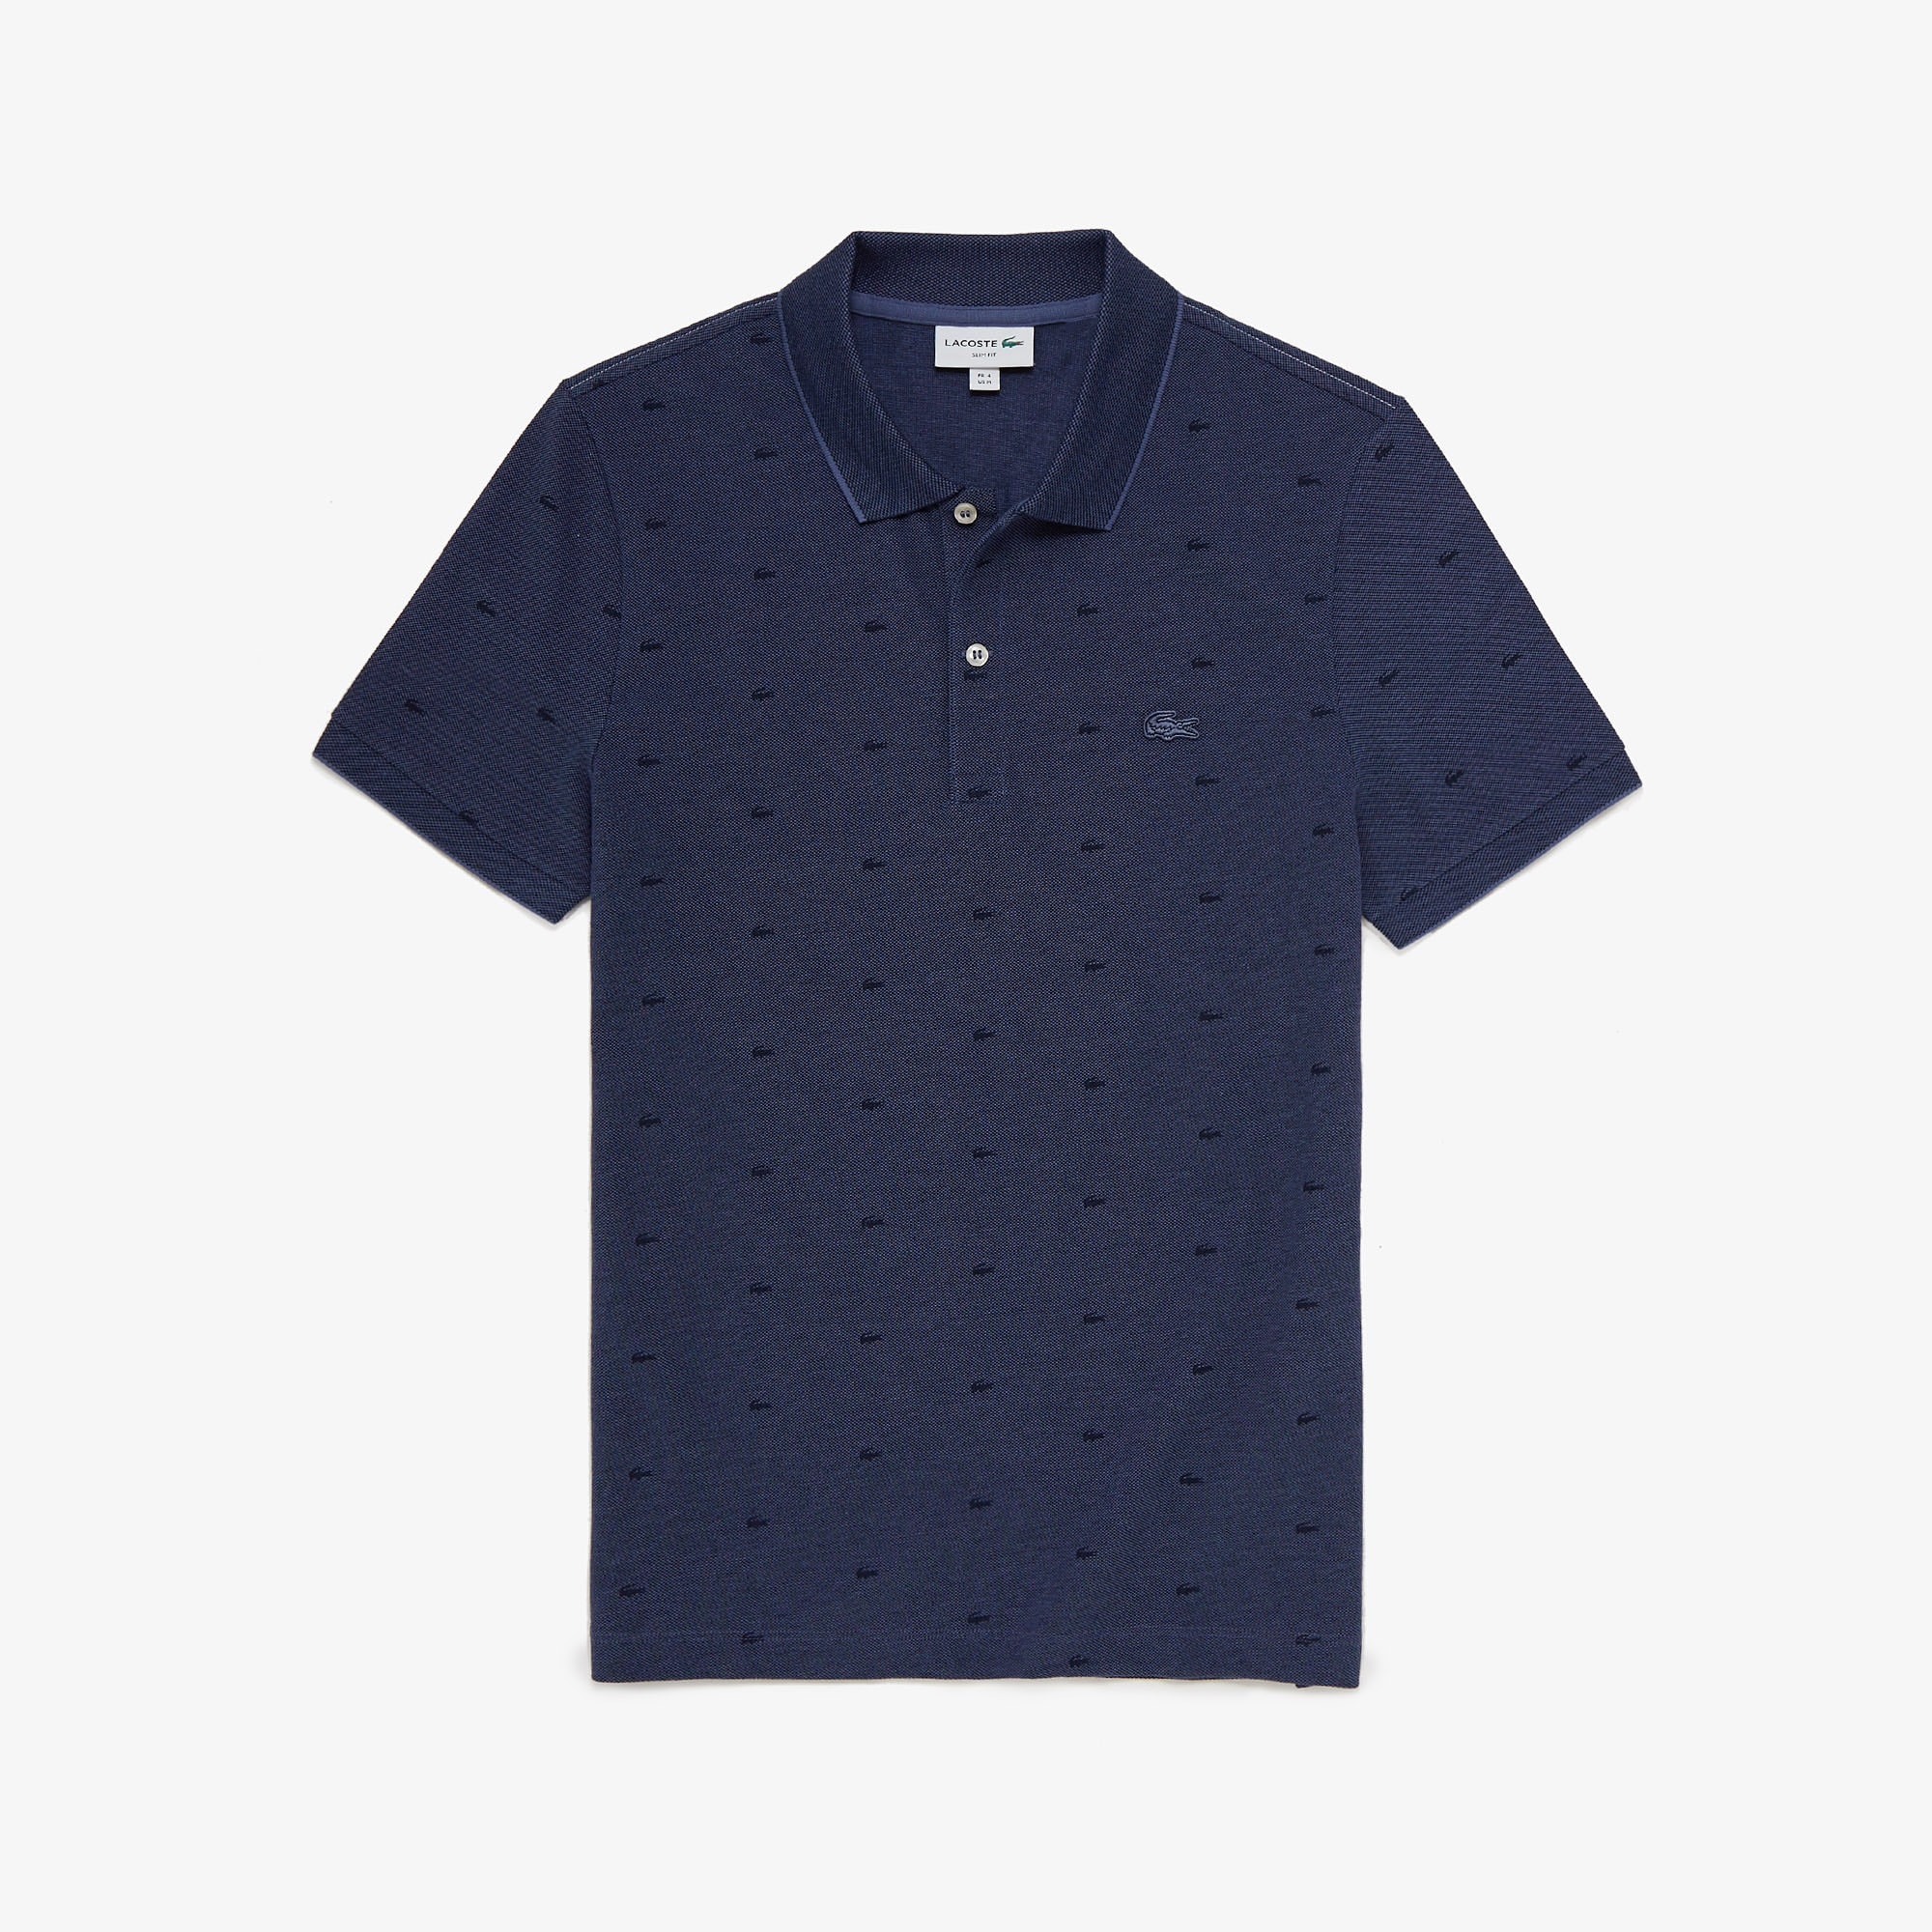 Lacoste Mens Micro Print Polo Shirt